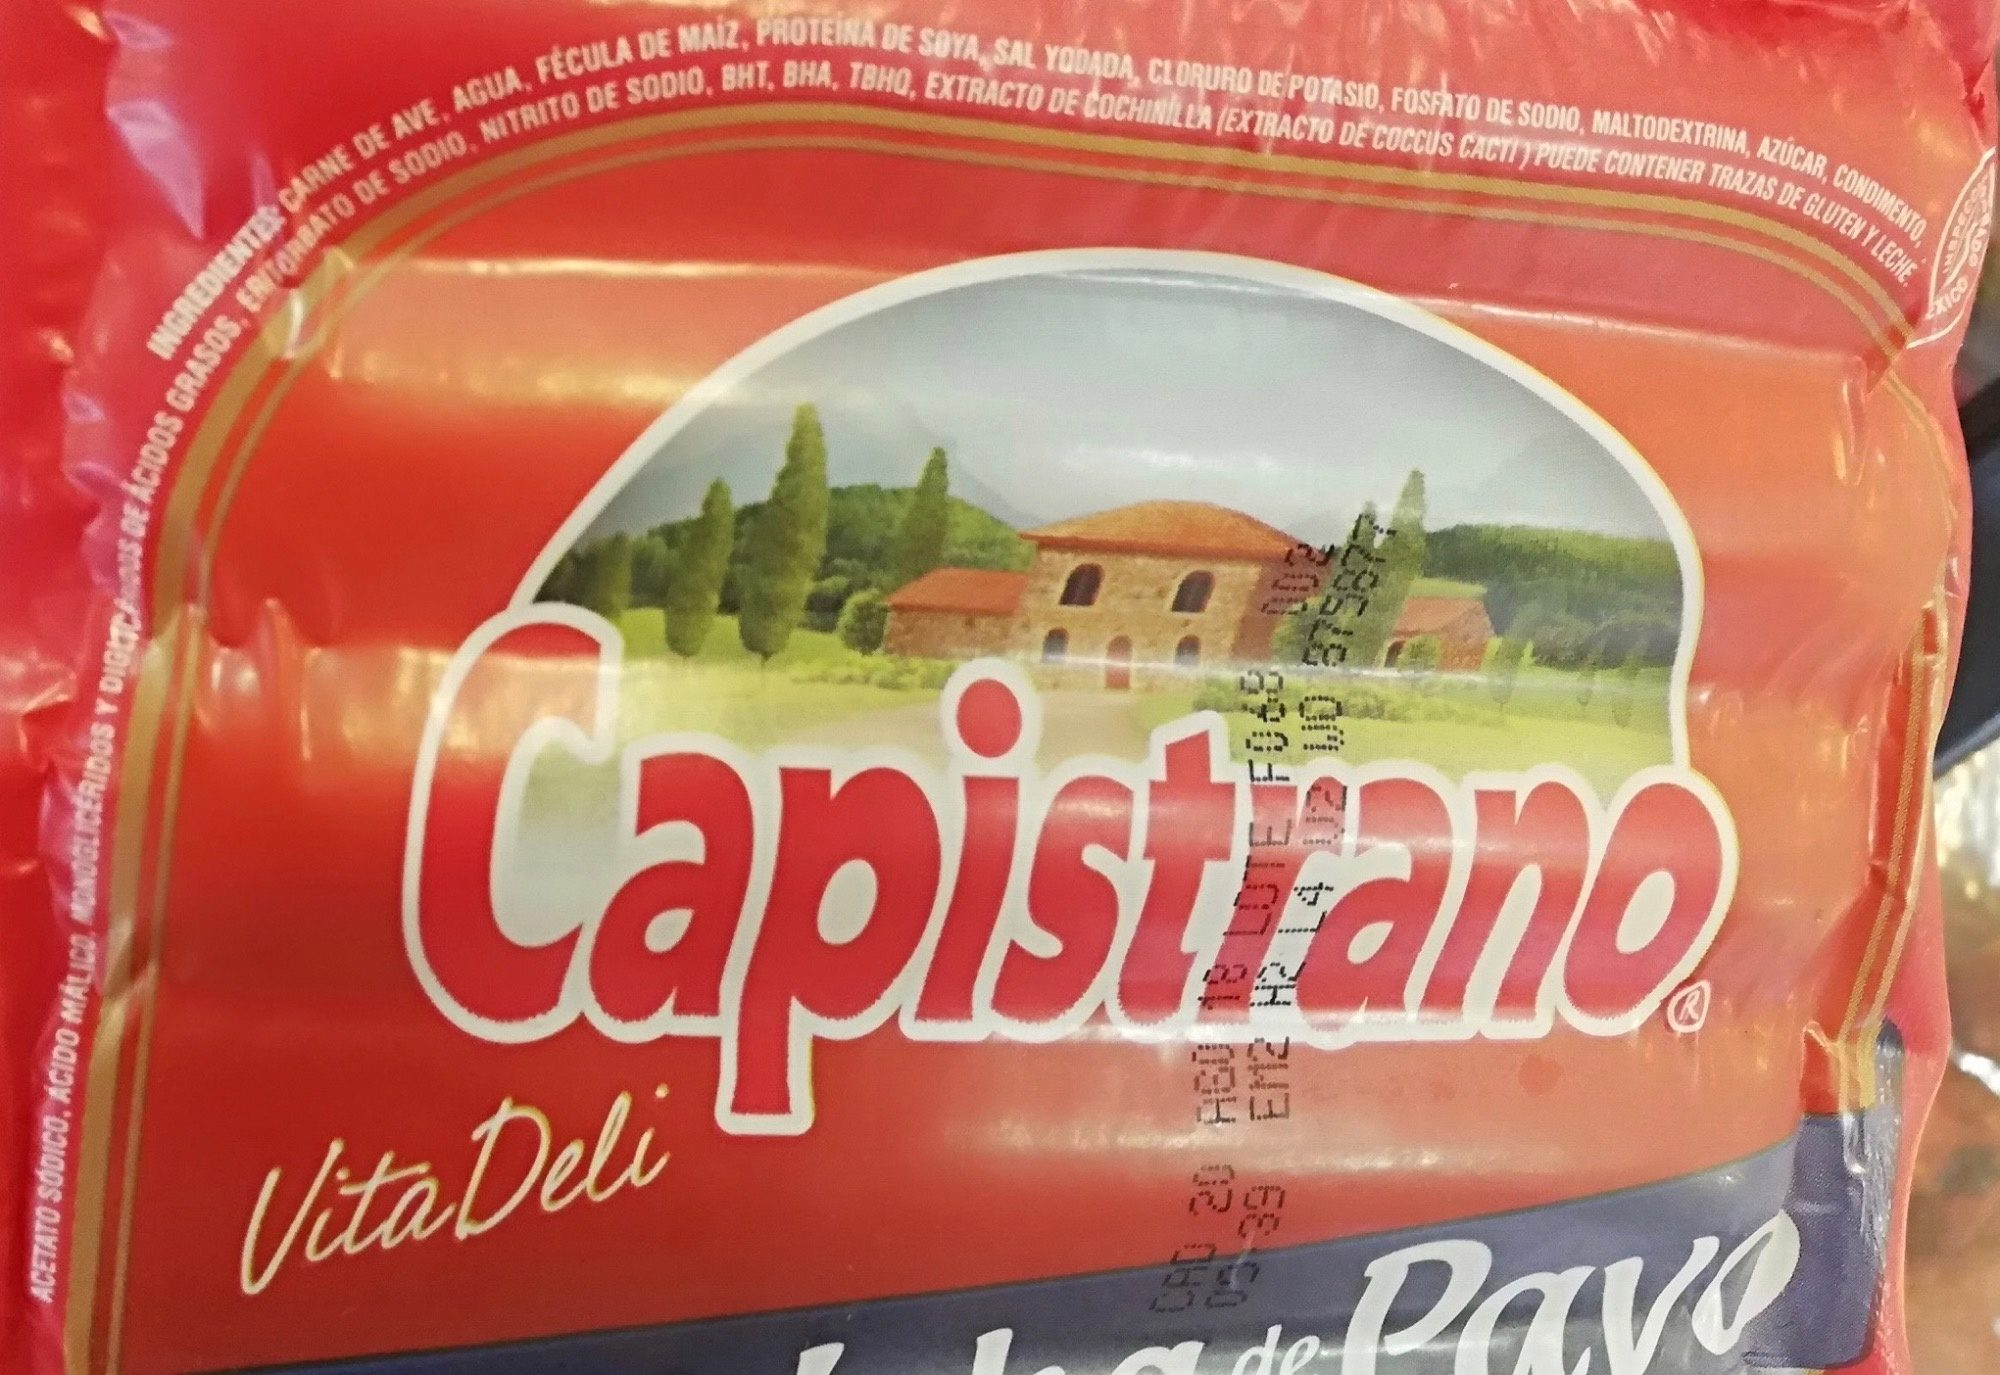 Capistrano Salchicha de Pavo - Ingredients - es